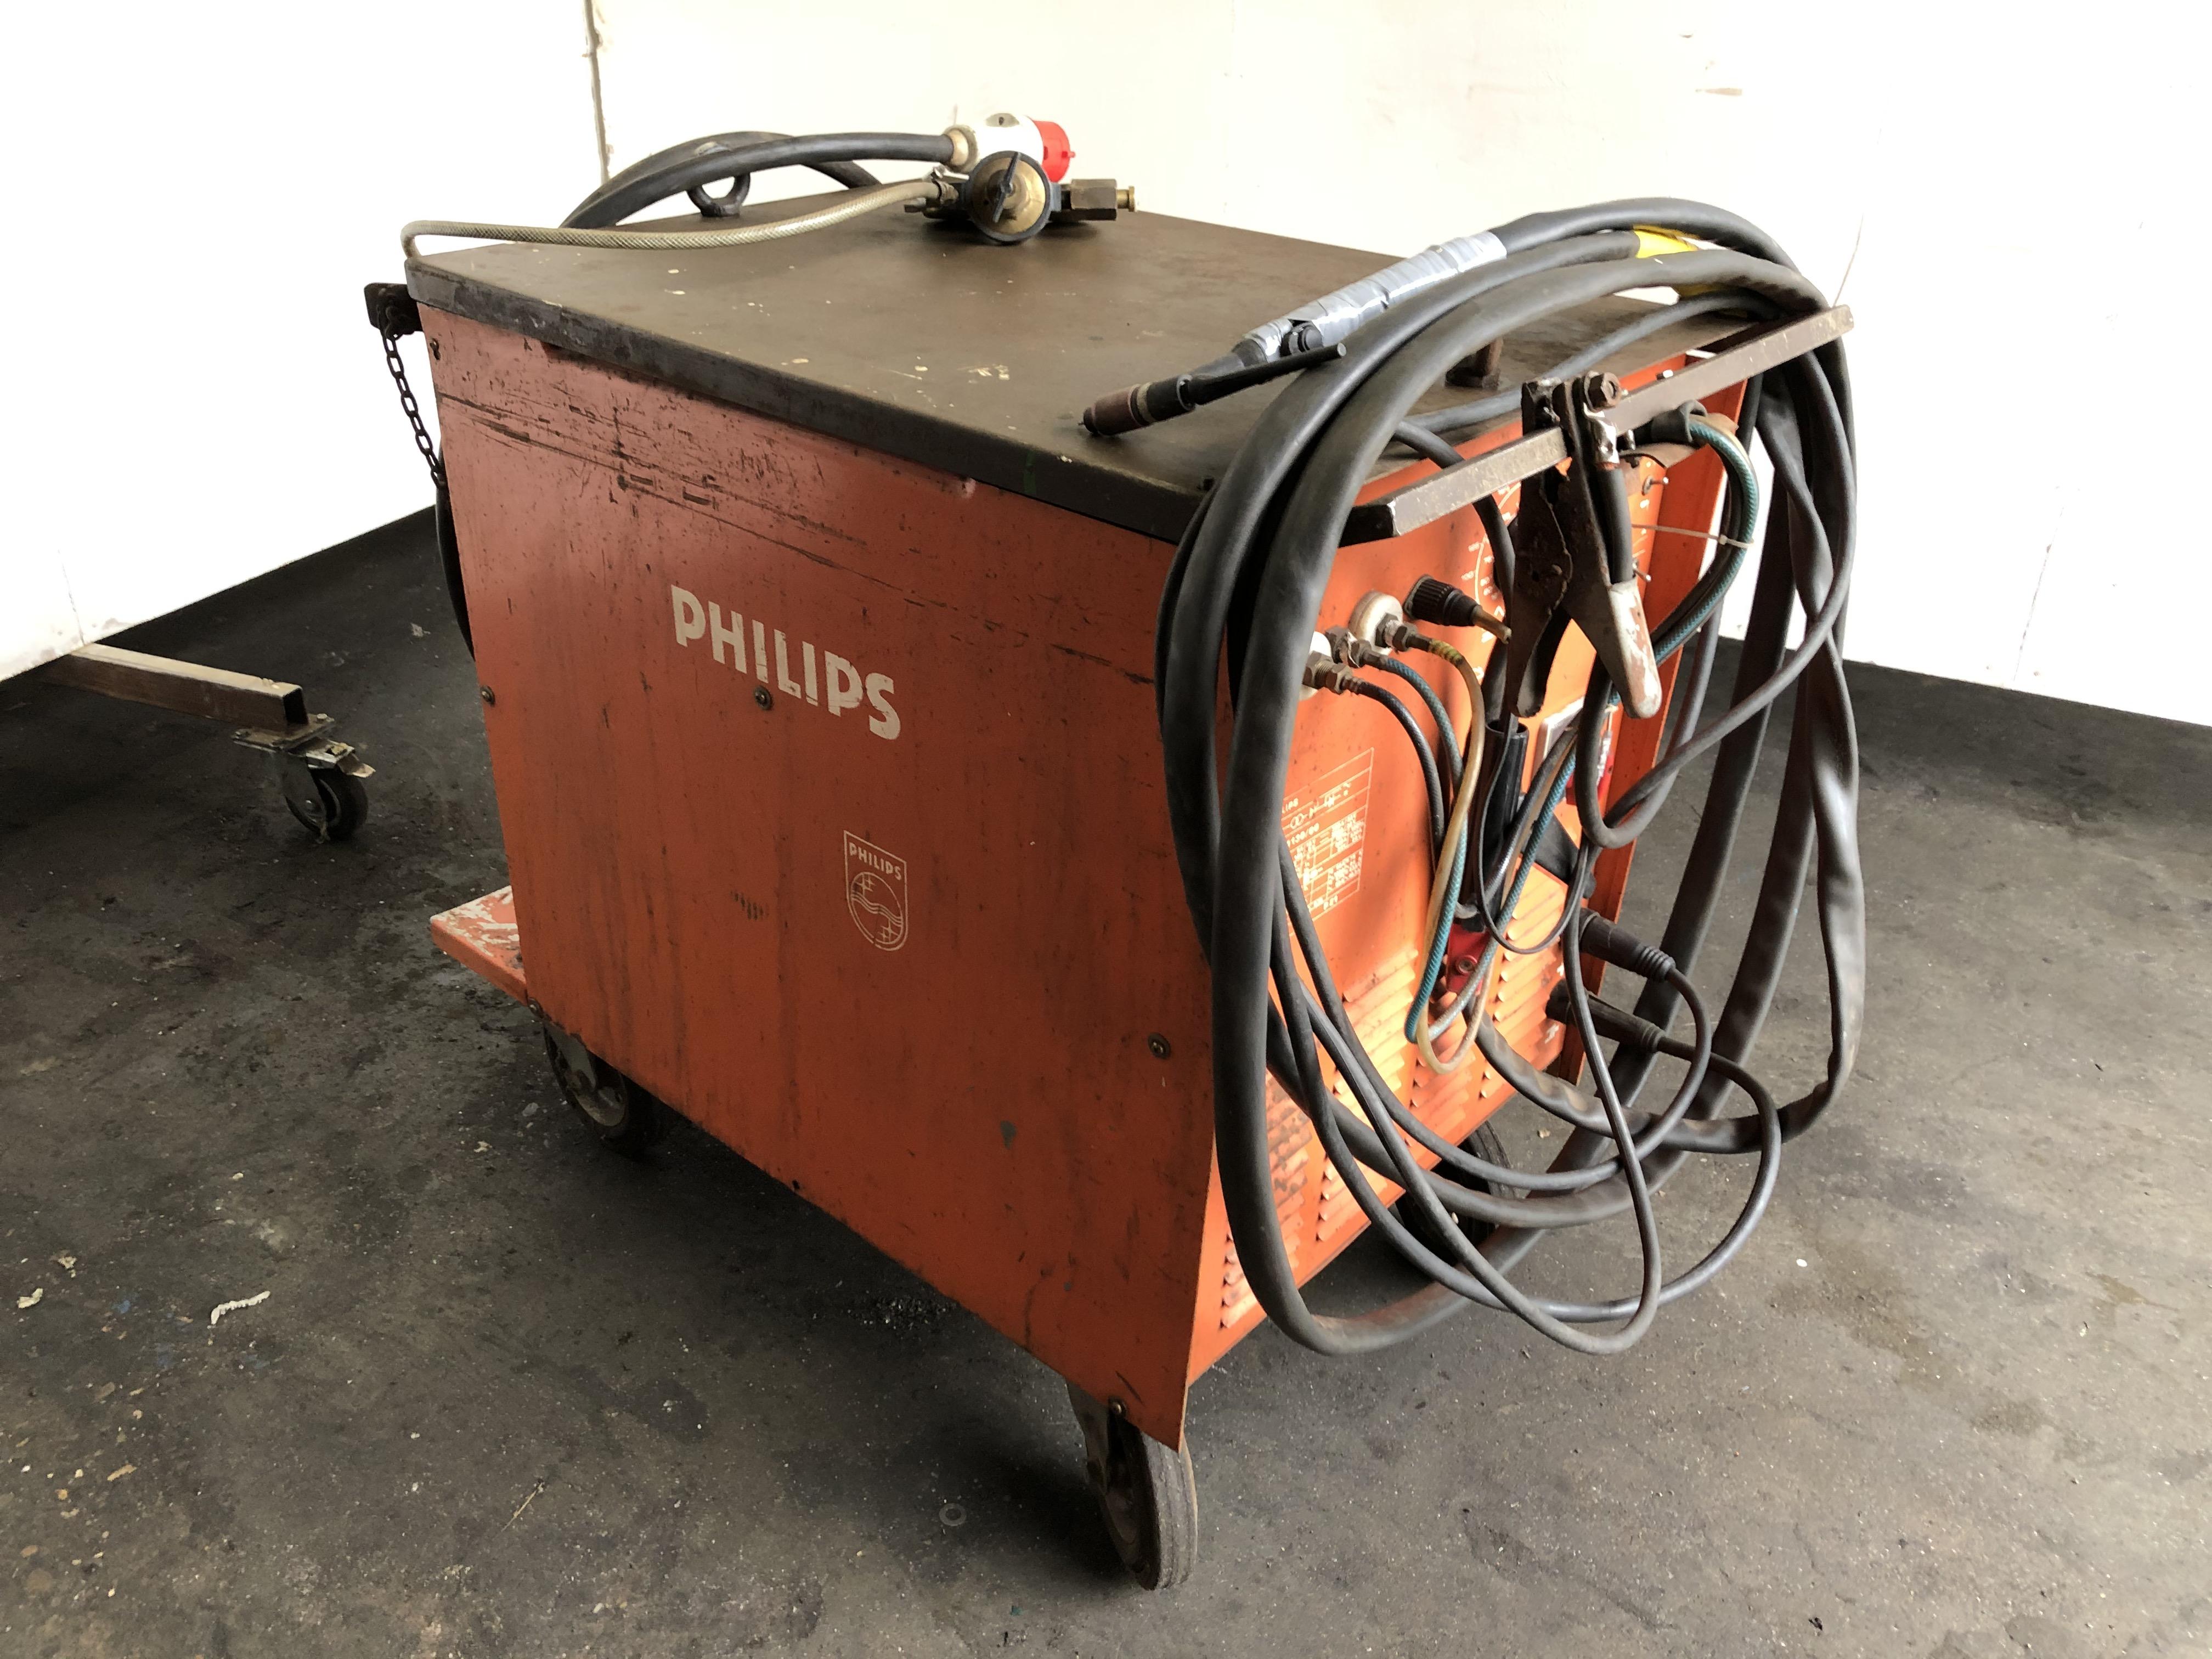 Philips PZ 1130/00 1131/00